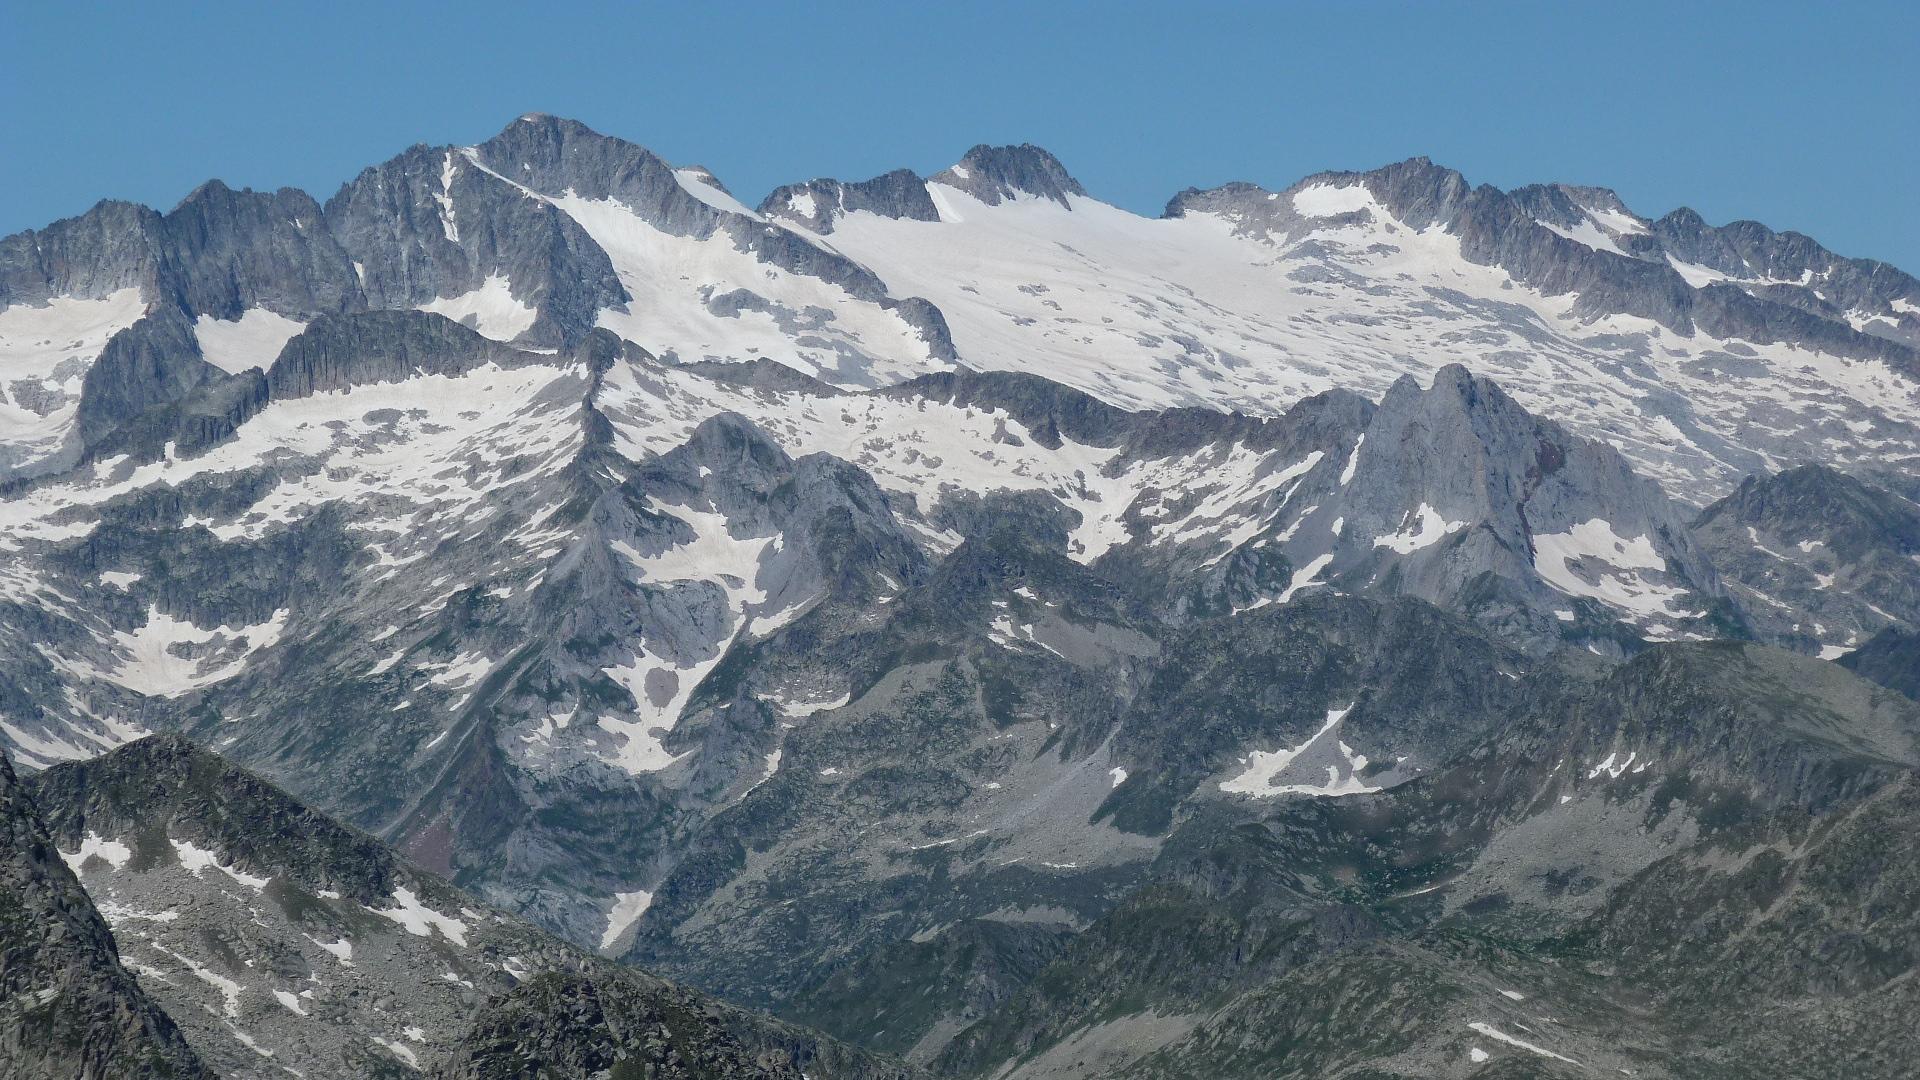 Pico de Aneto (3404 m) : Photos, Diagrams & Topos : SummitPost.